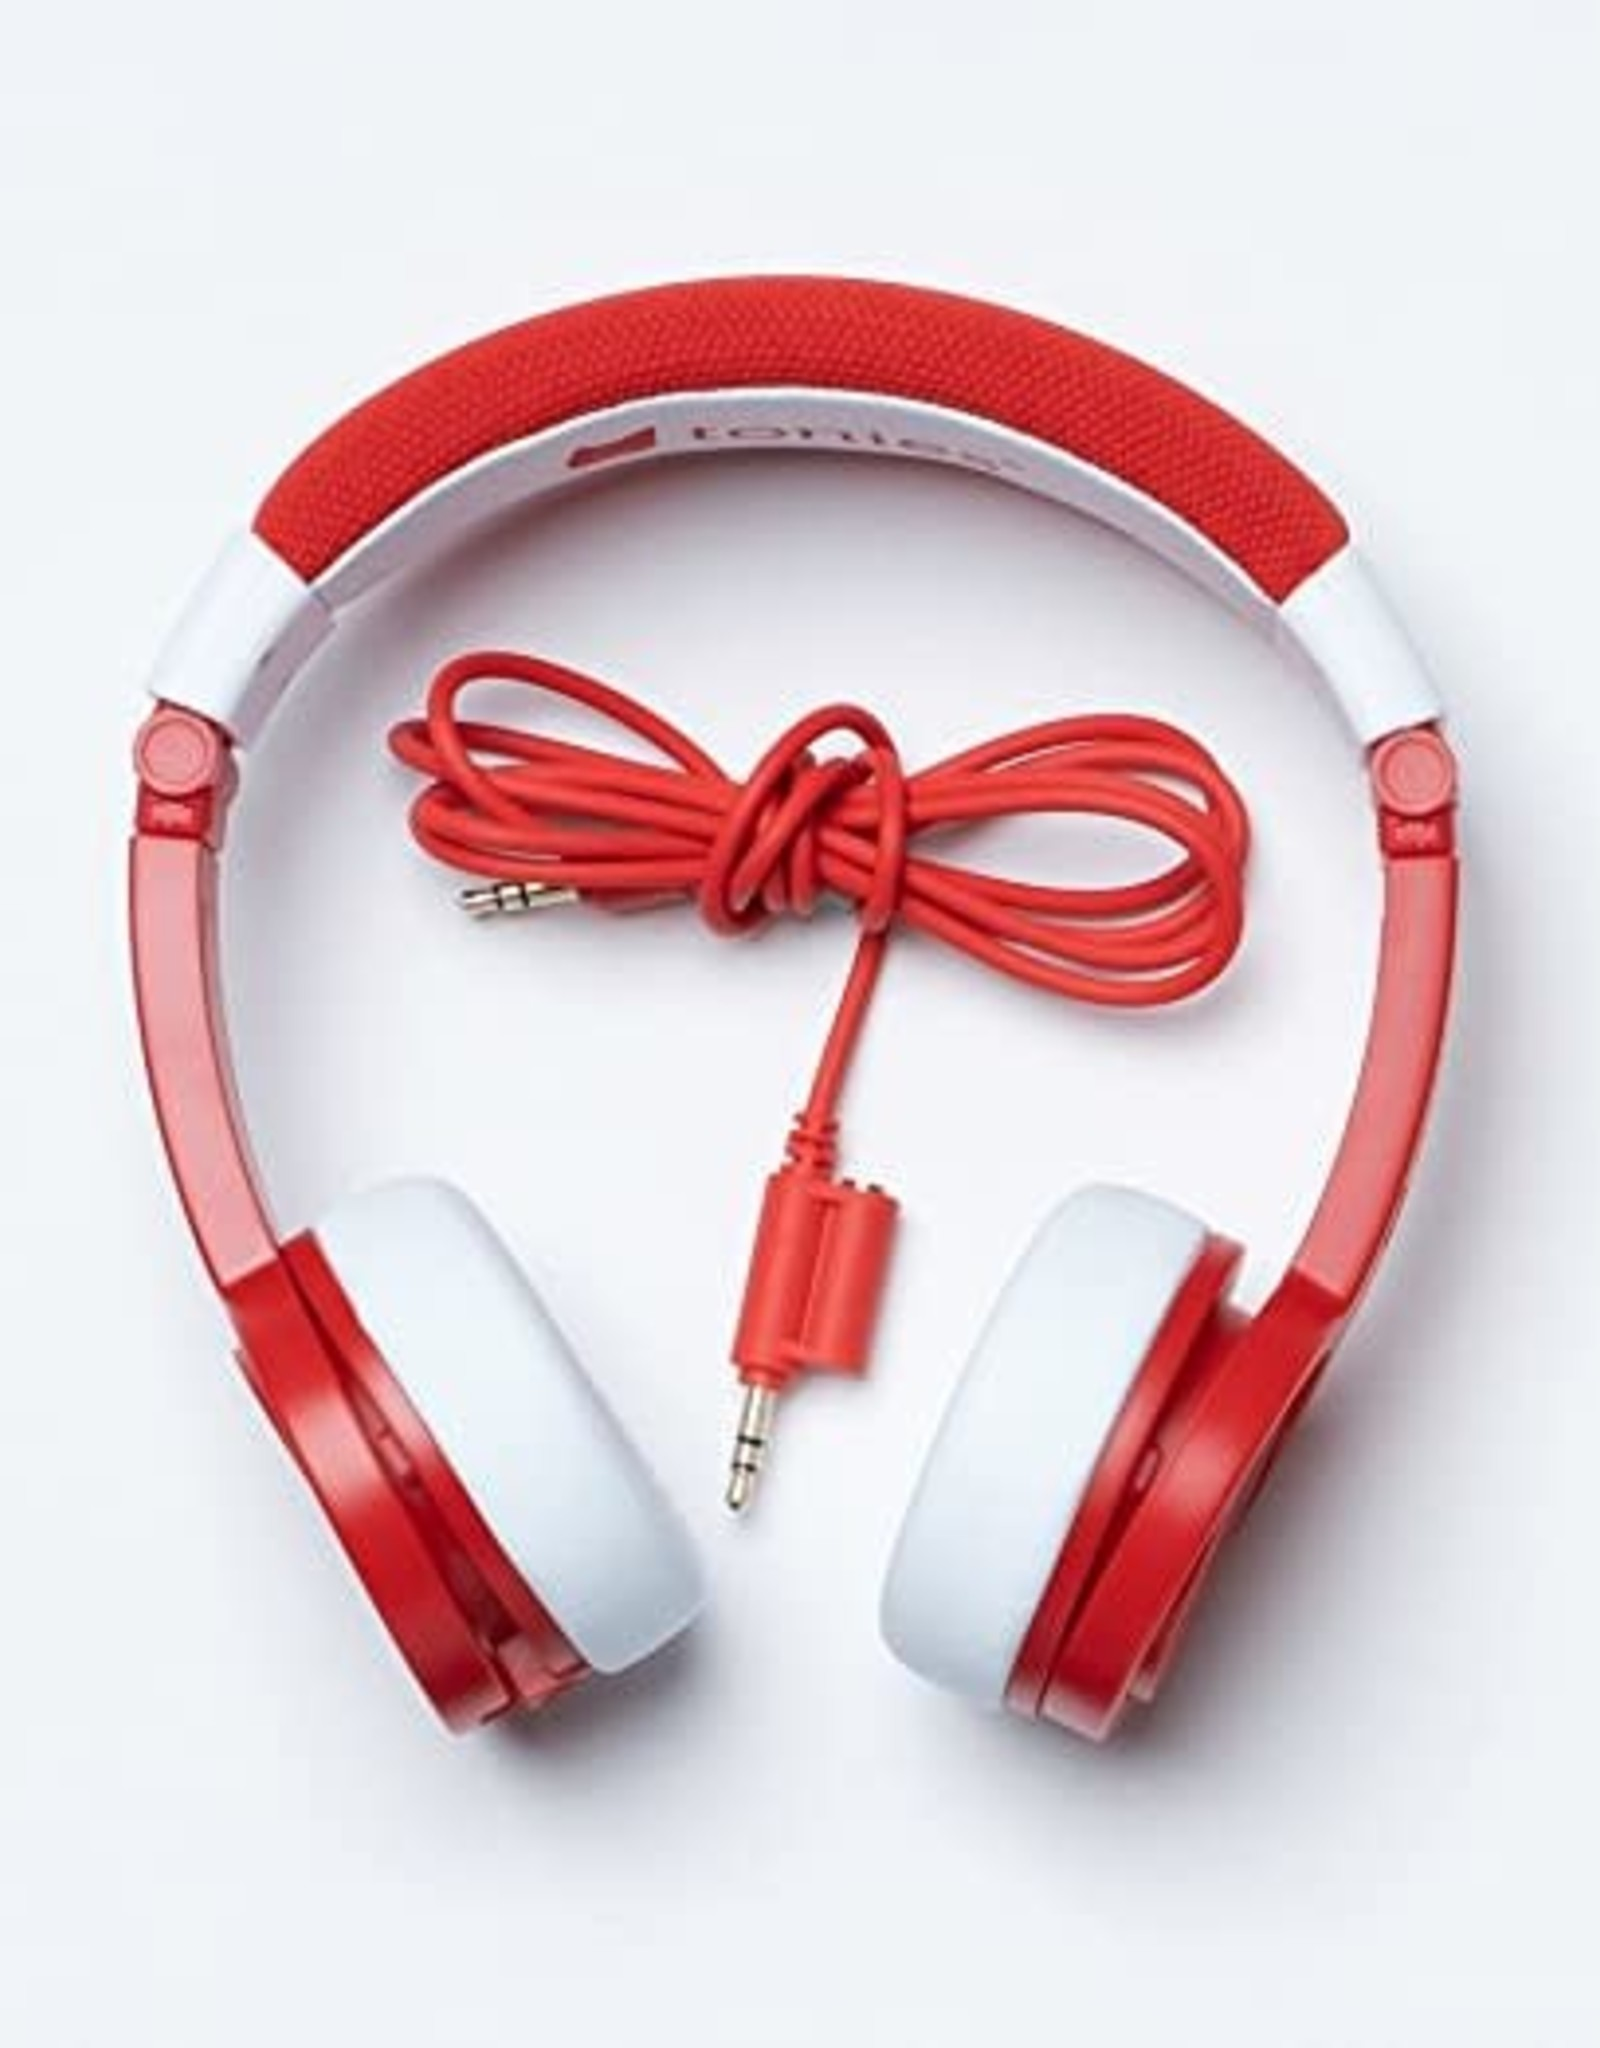 RED HEADPHONES TONIES